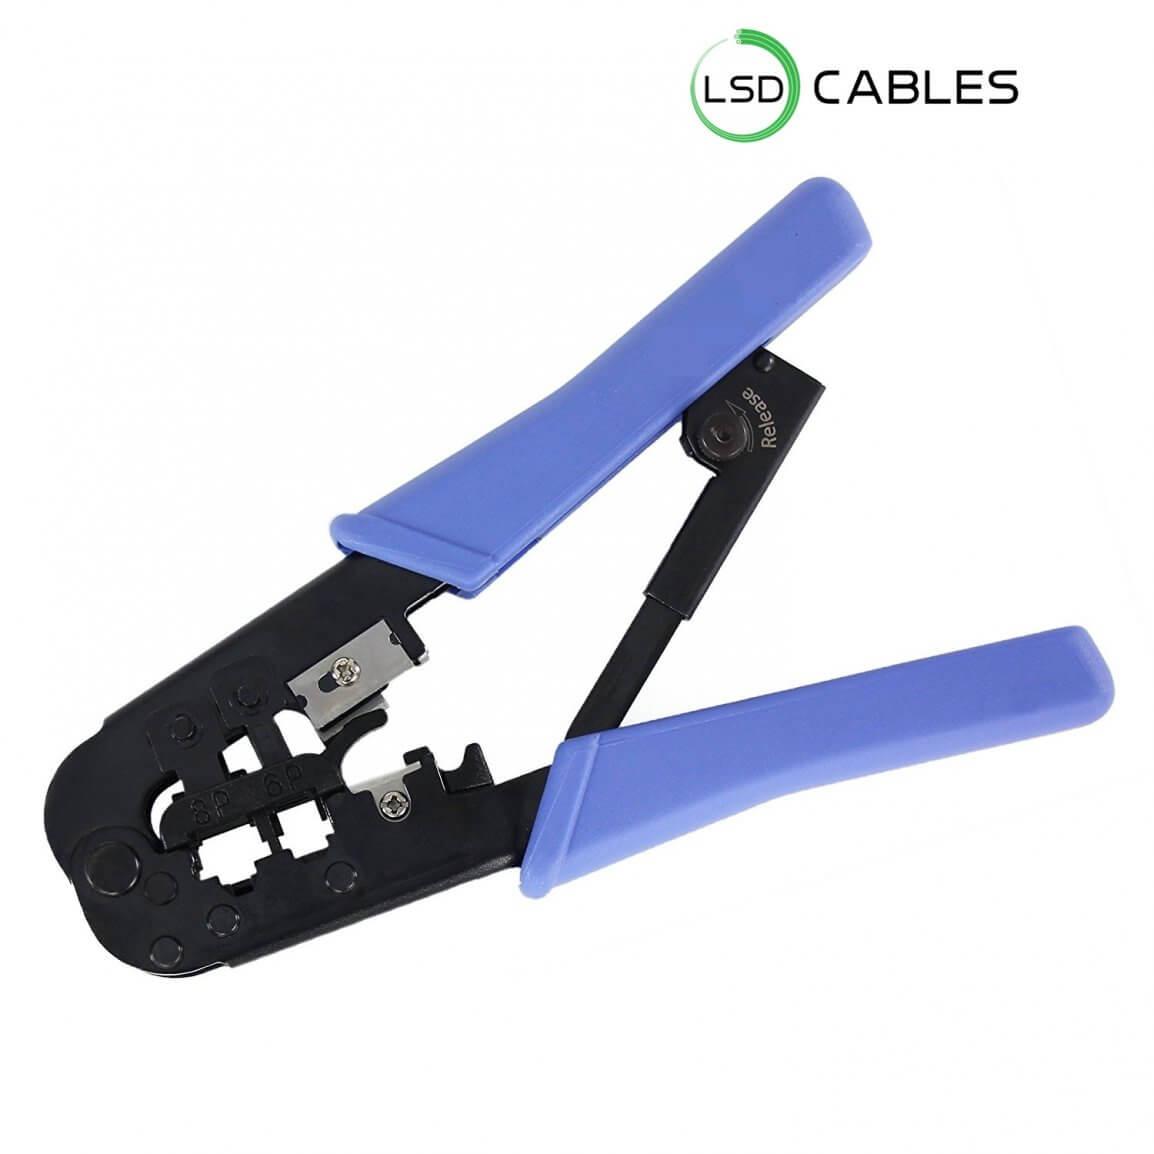 LSDCABLES RJ45 Crimping Tool L T01 1 1154x1154 - Crimping Tool Easy Handling RJ45 Connector  L-T01